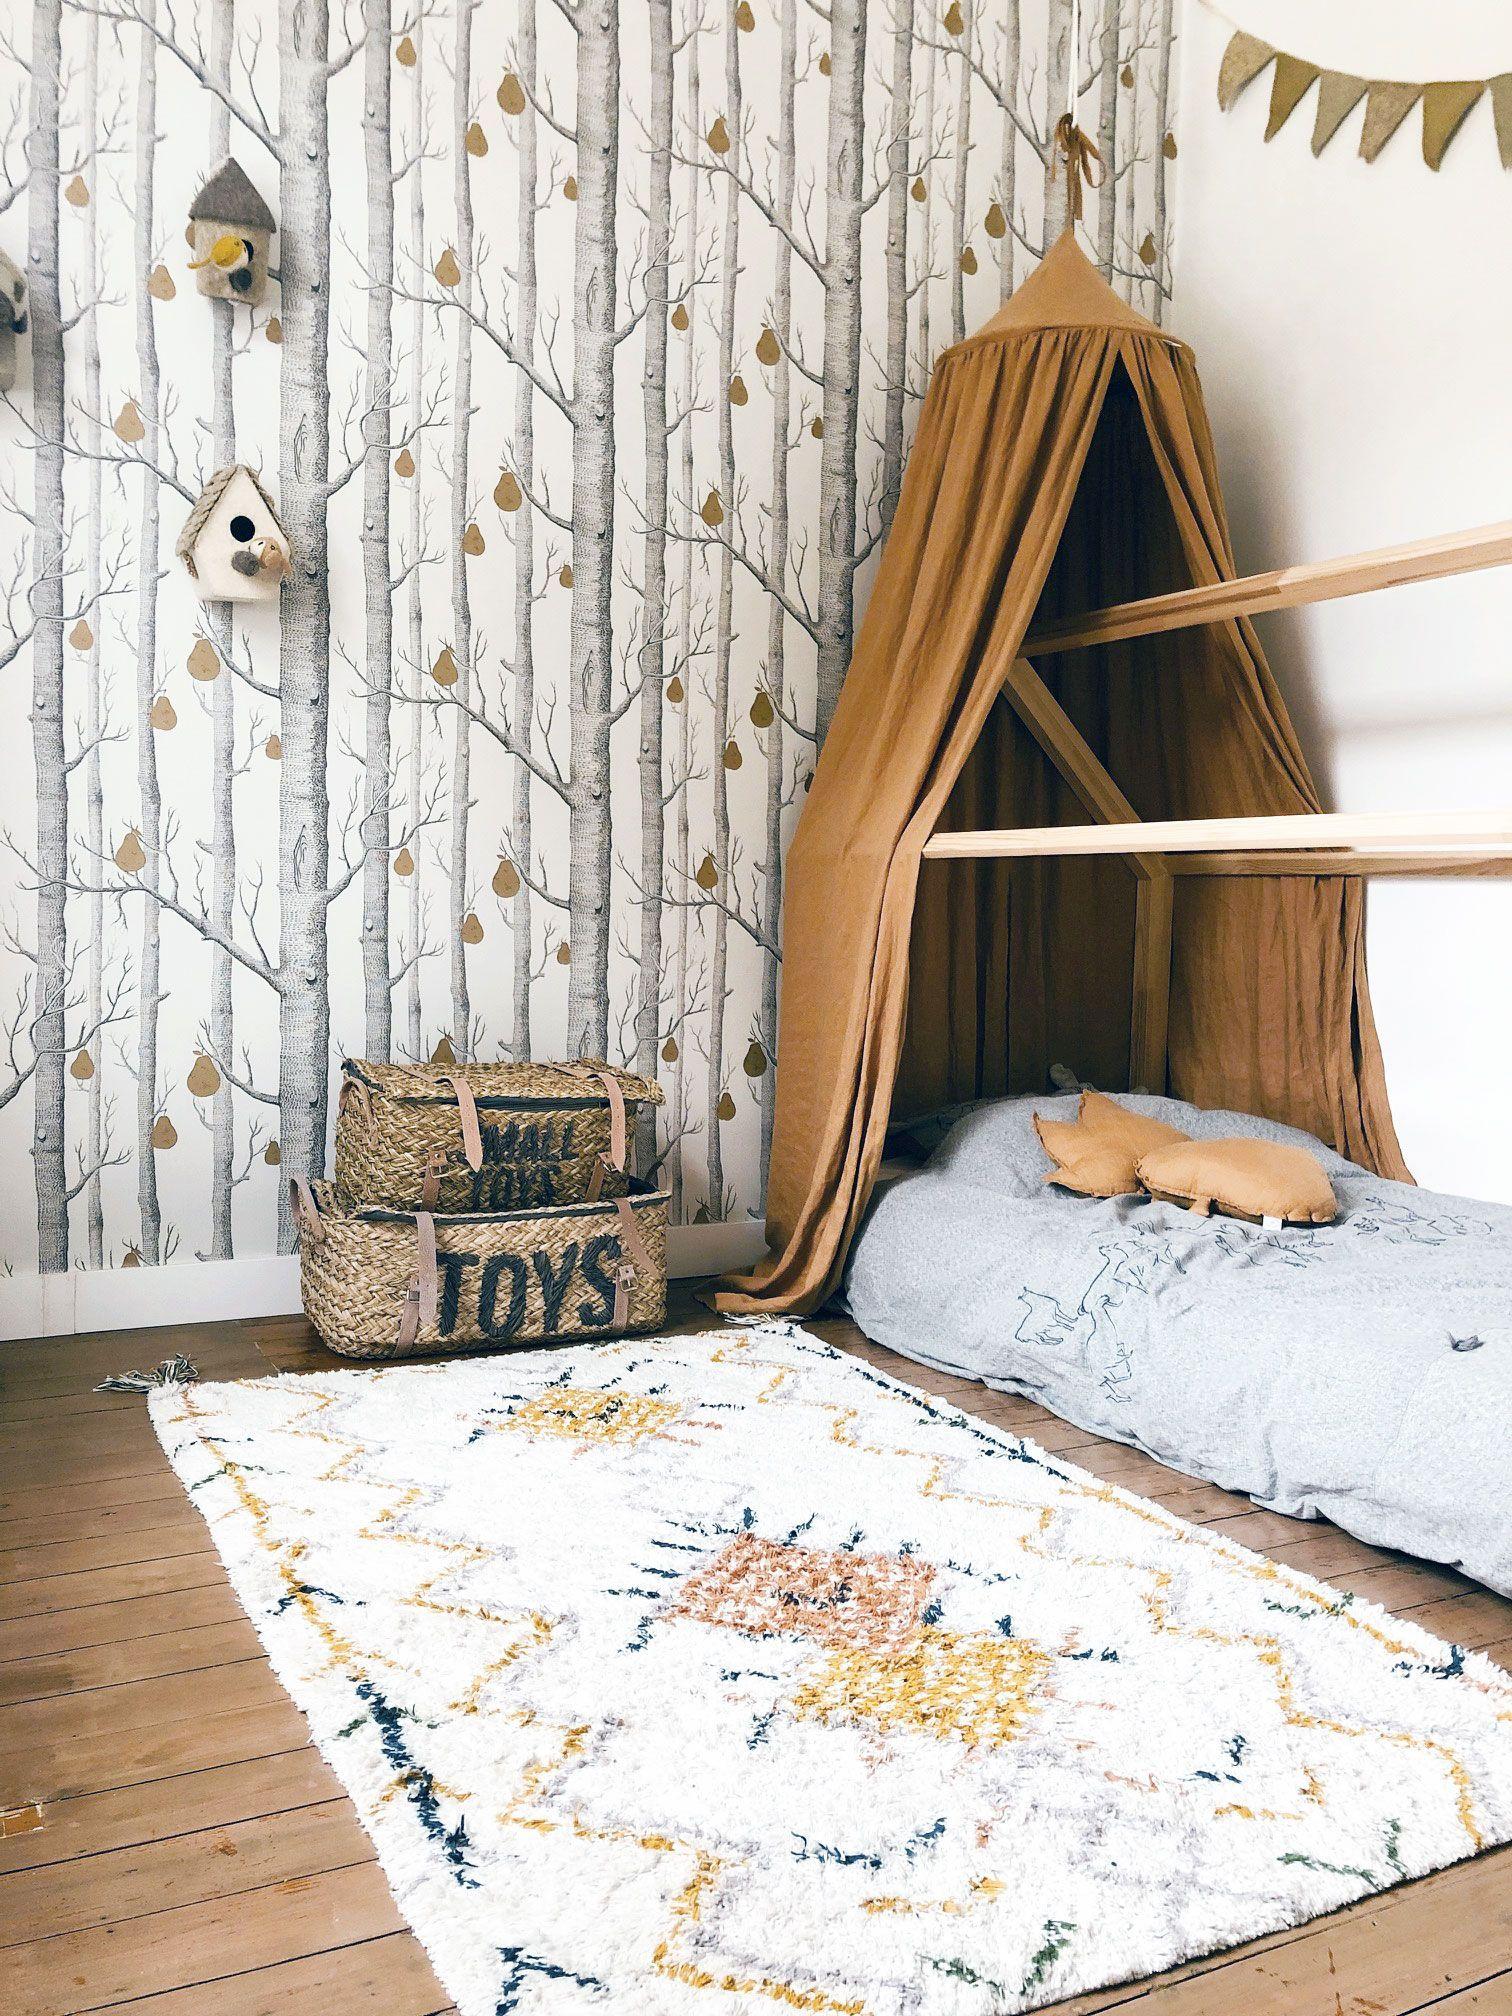 Woods Pears Wallpaper Schwarzweisswald Und Goldene Birne In 2020 Boys Room Wallpaper Kids Room Wallpaper Children Room Boy